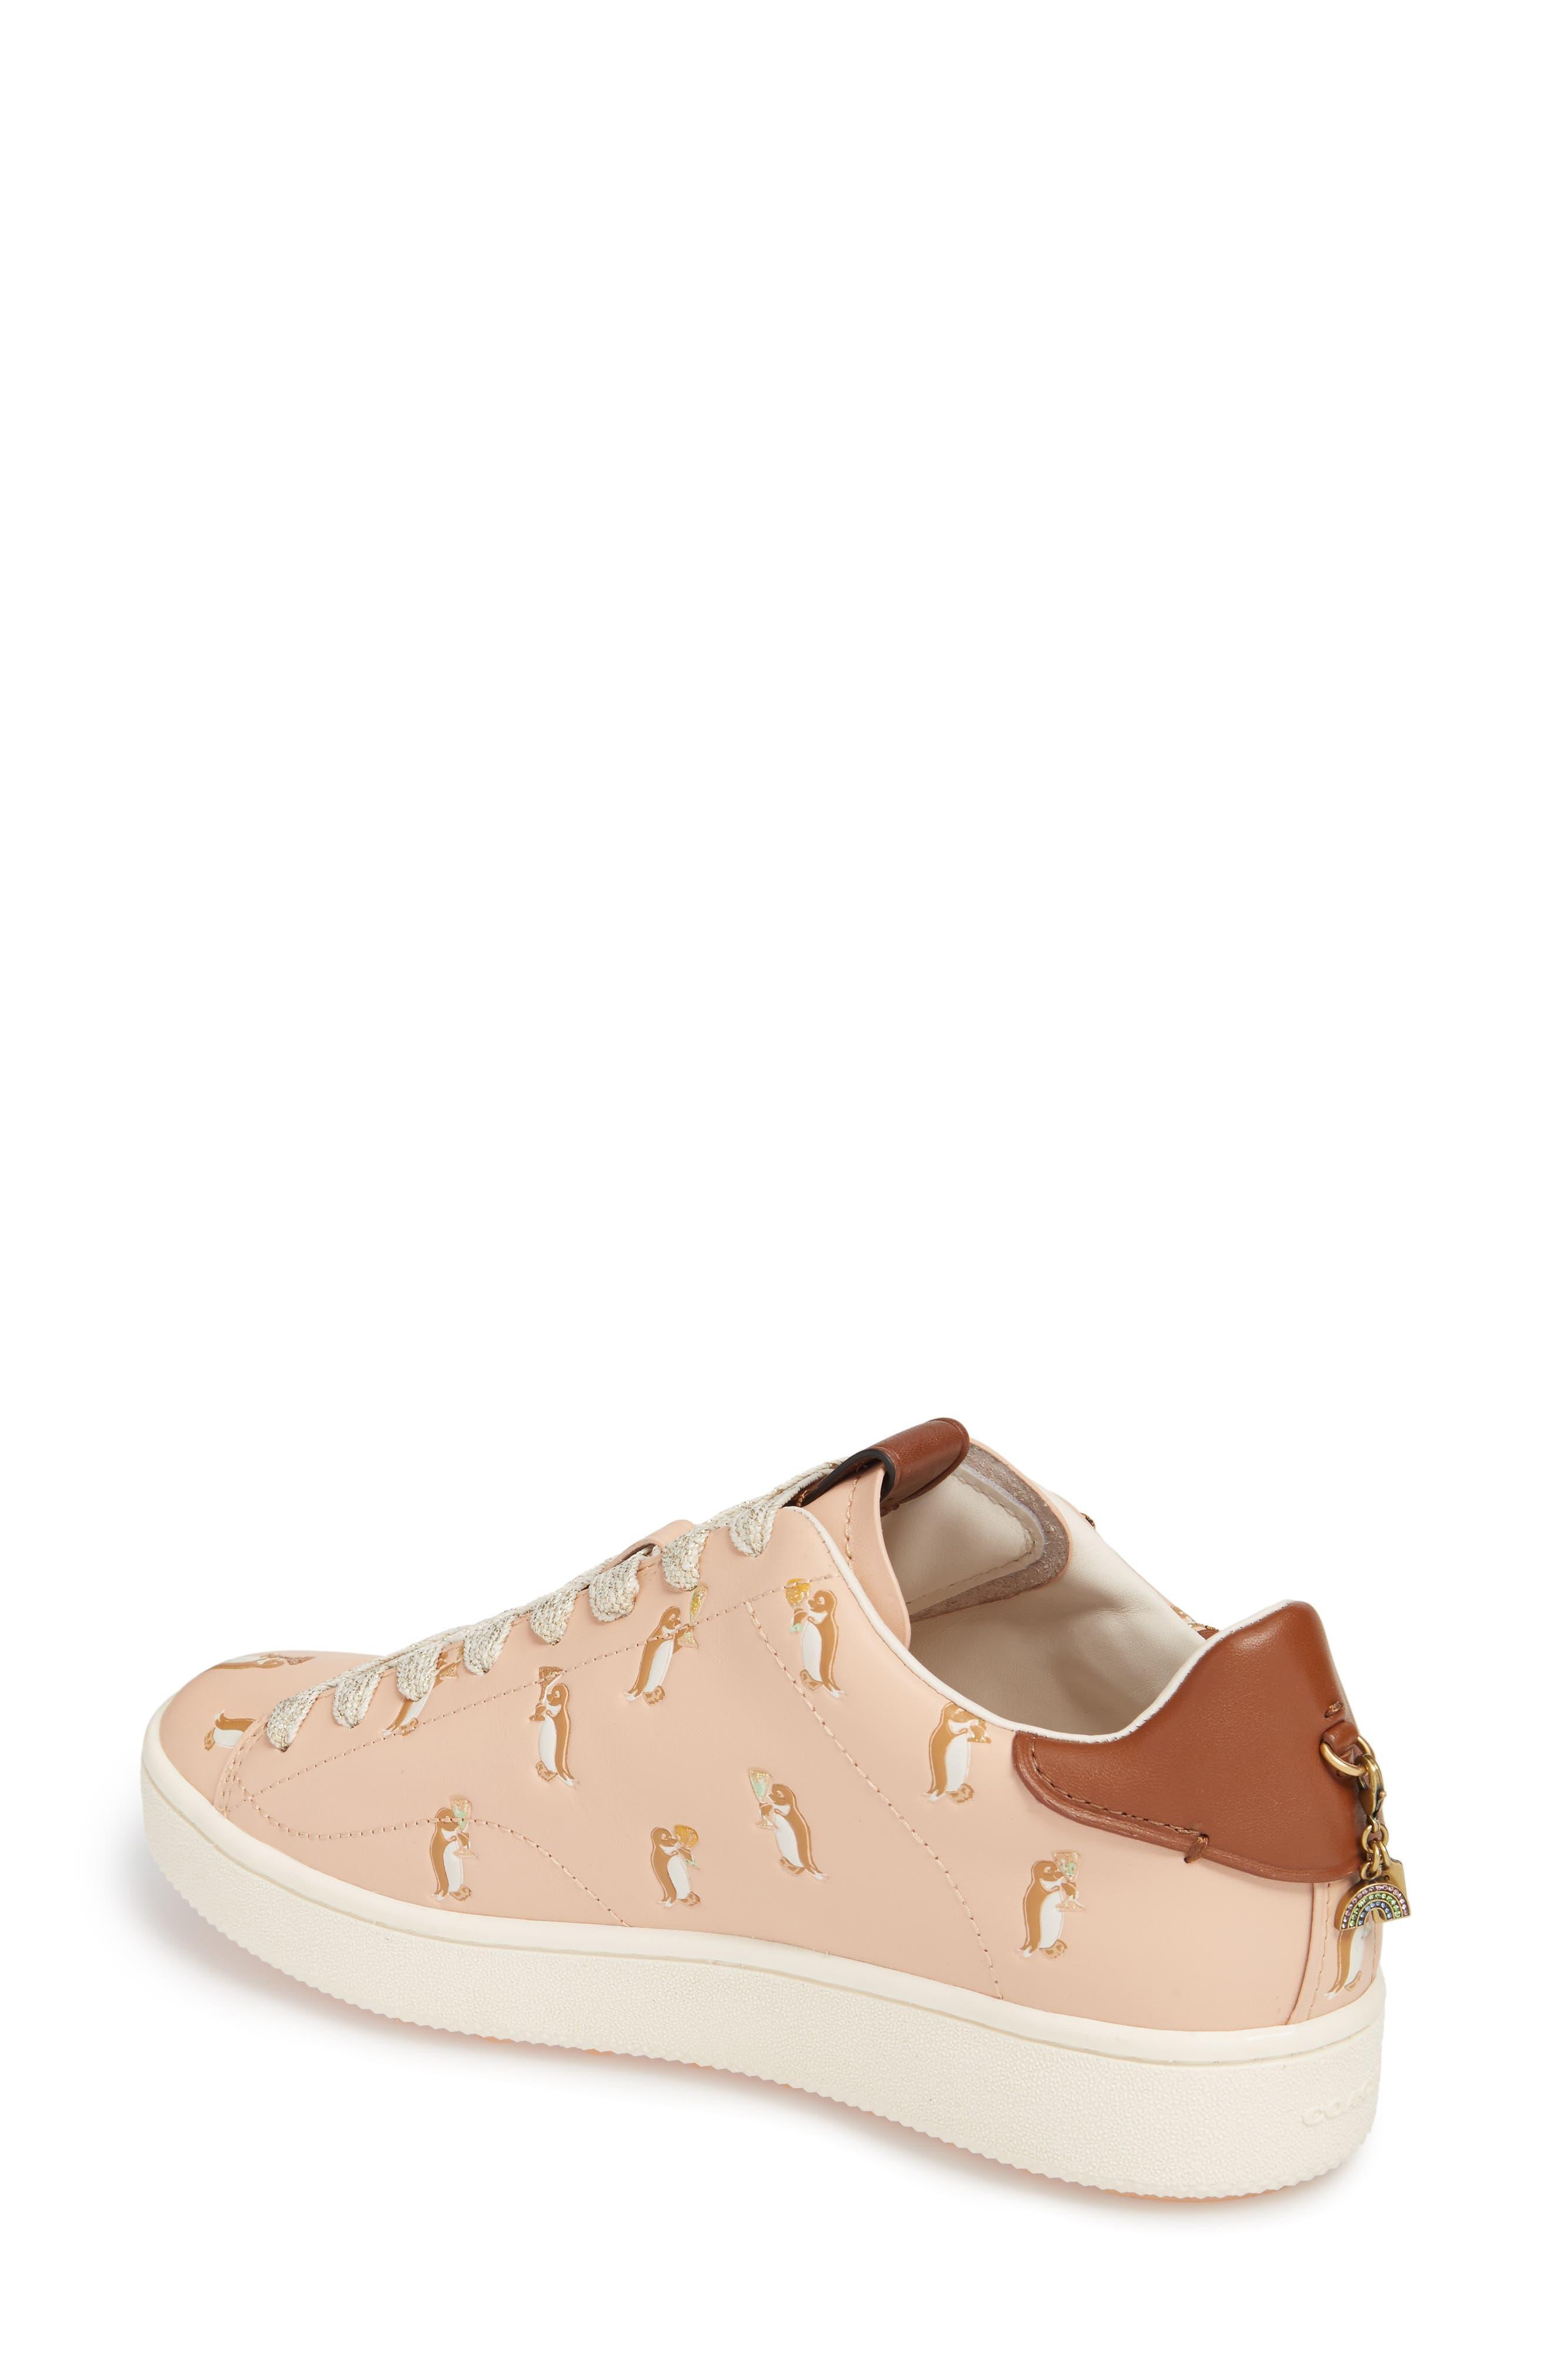 Patch Sneaker,                             Alternate thumbnail 2, color,                             650